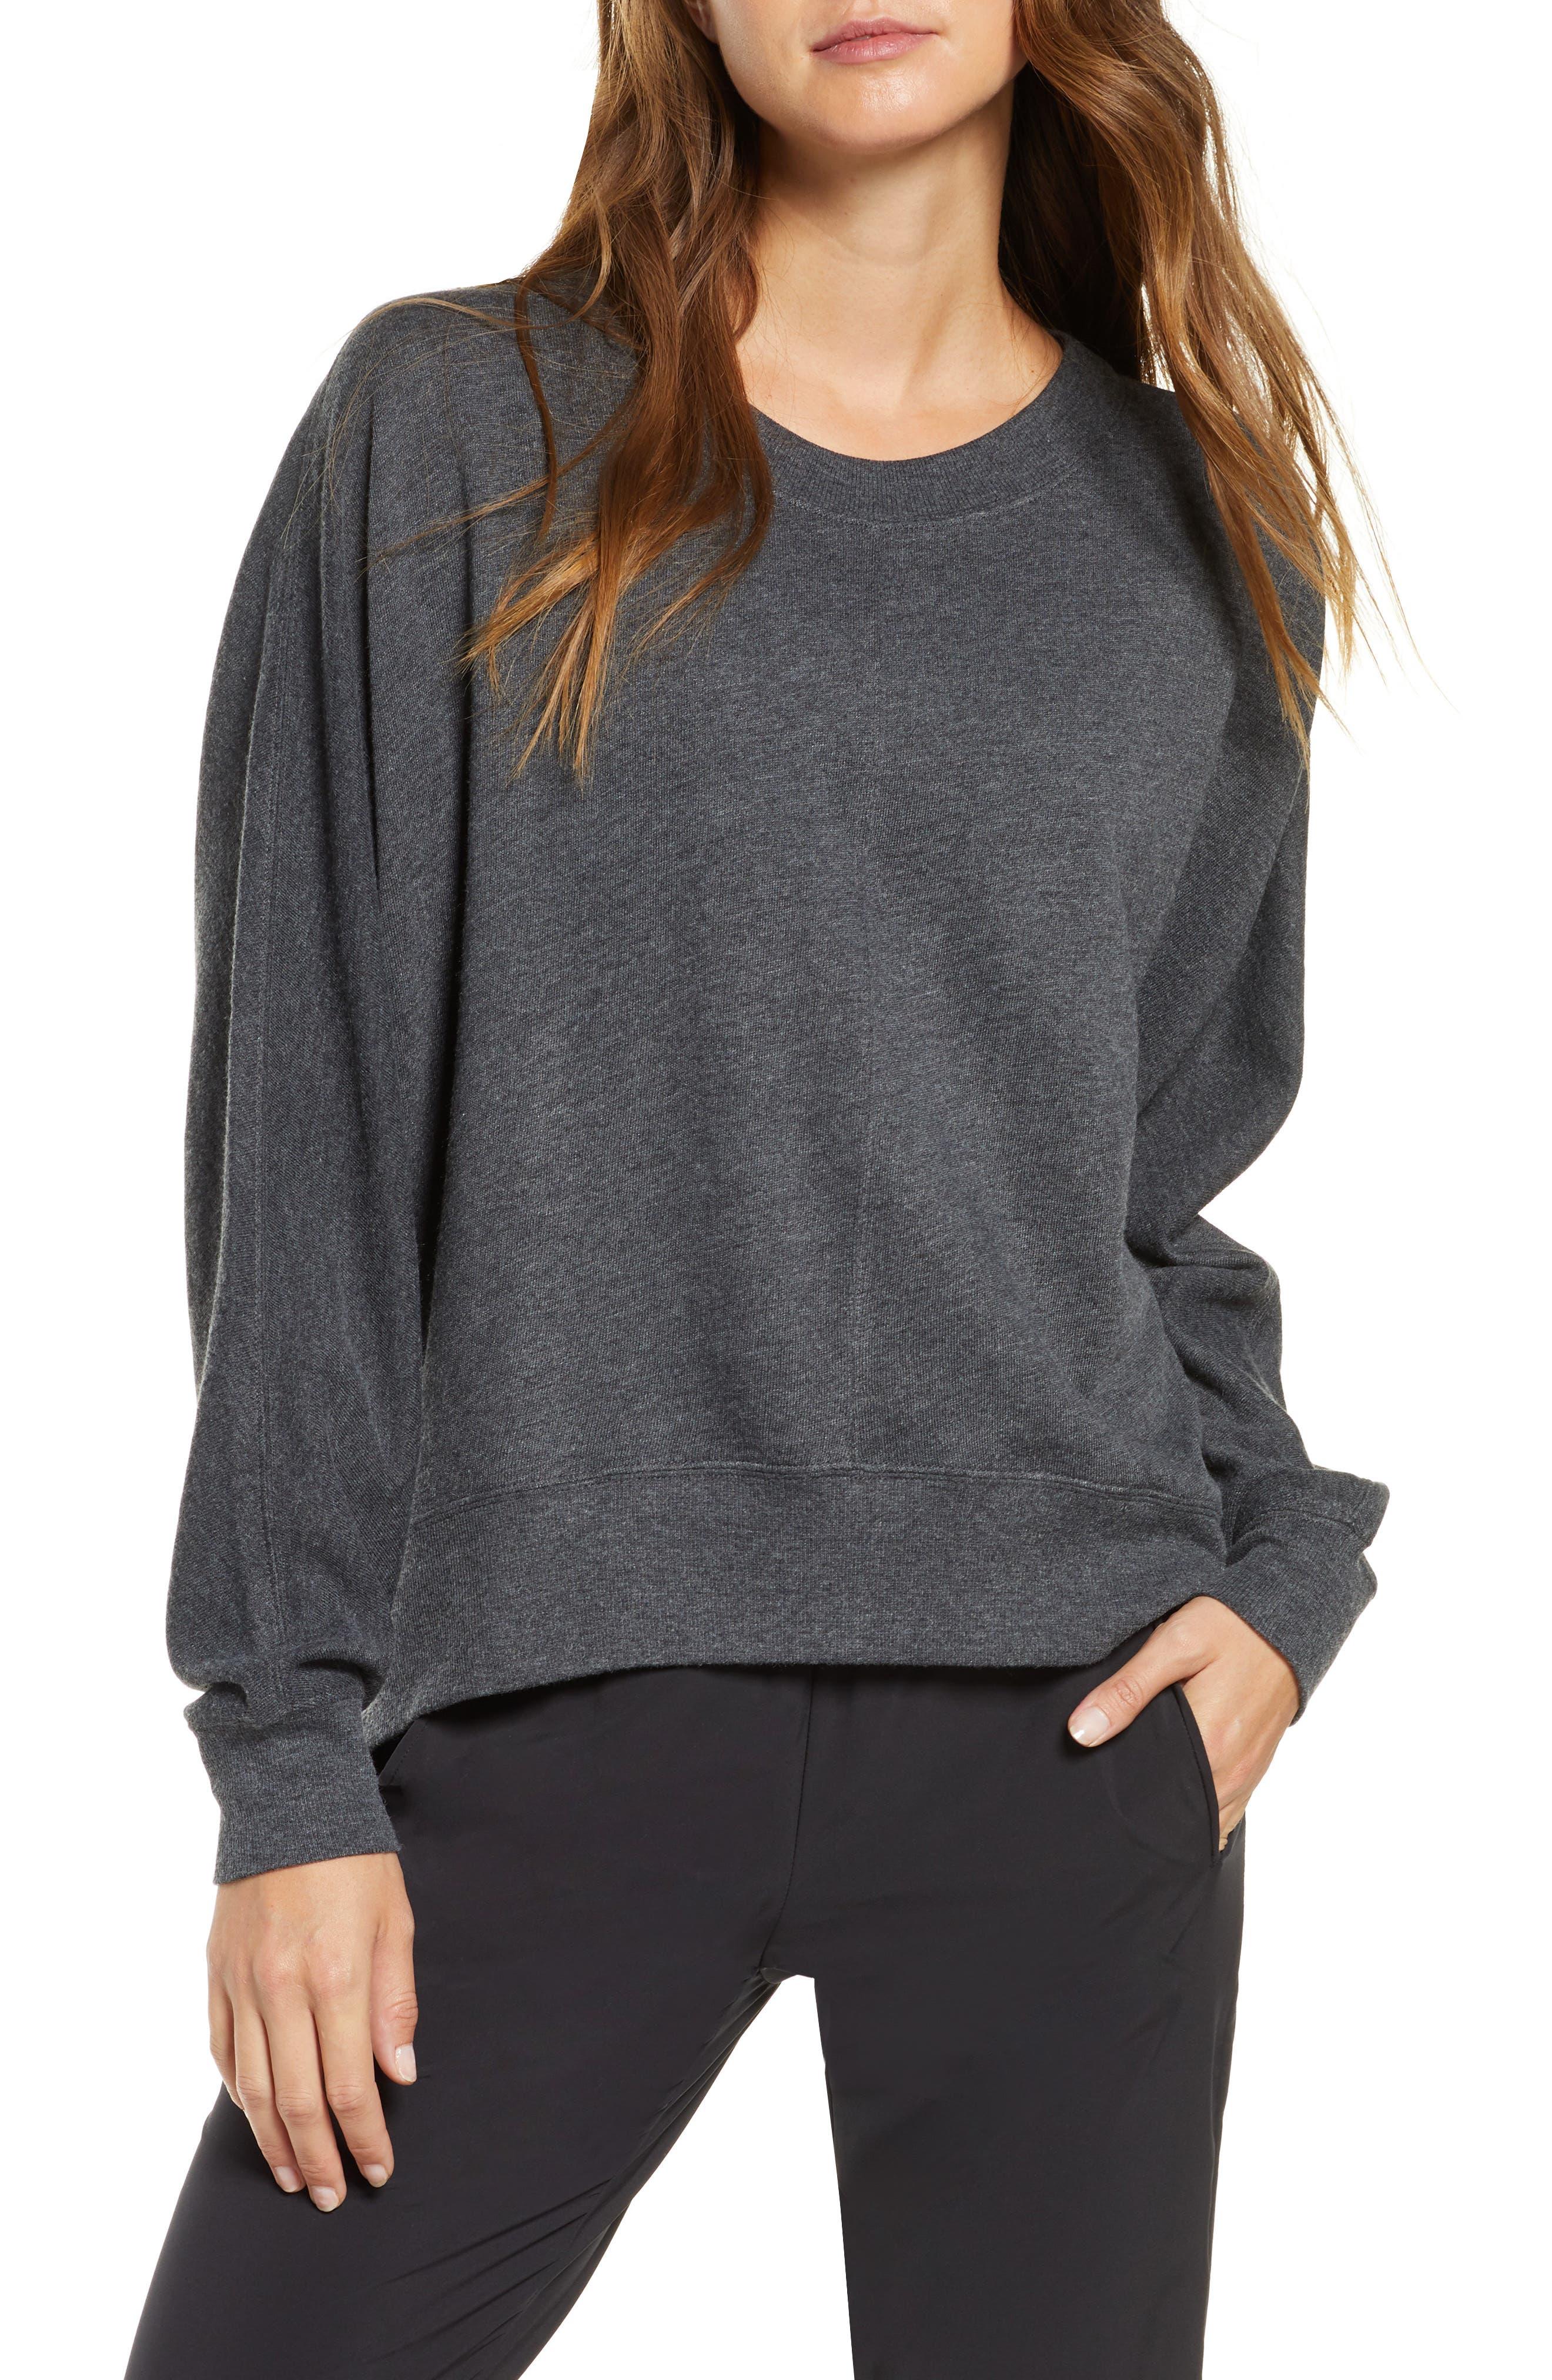 sweatshirt for womens